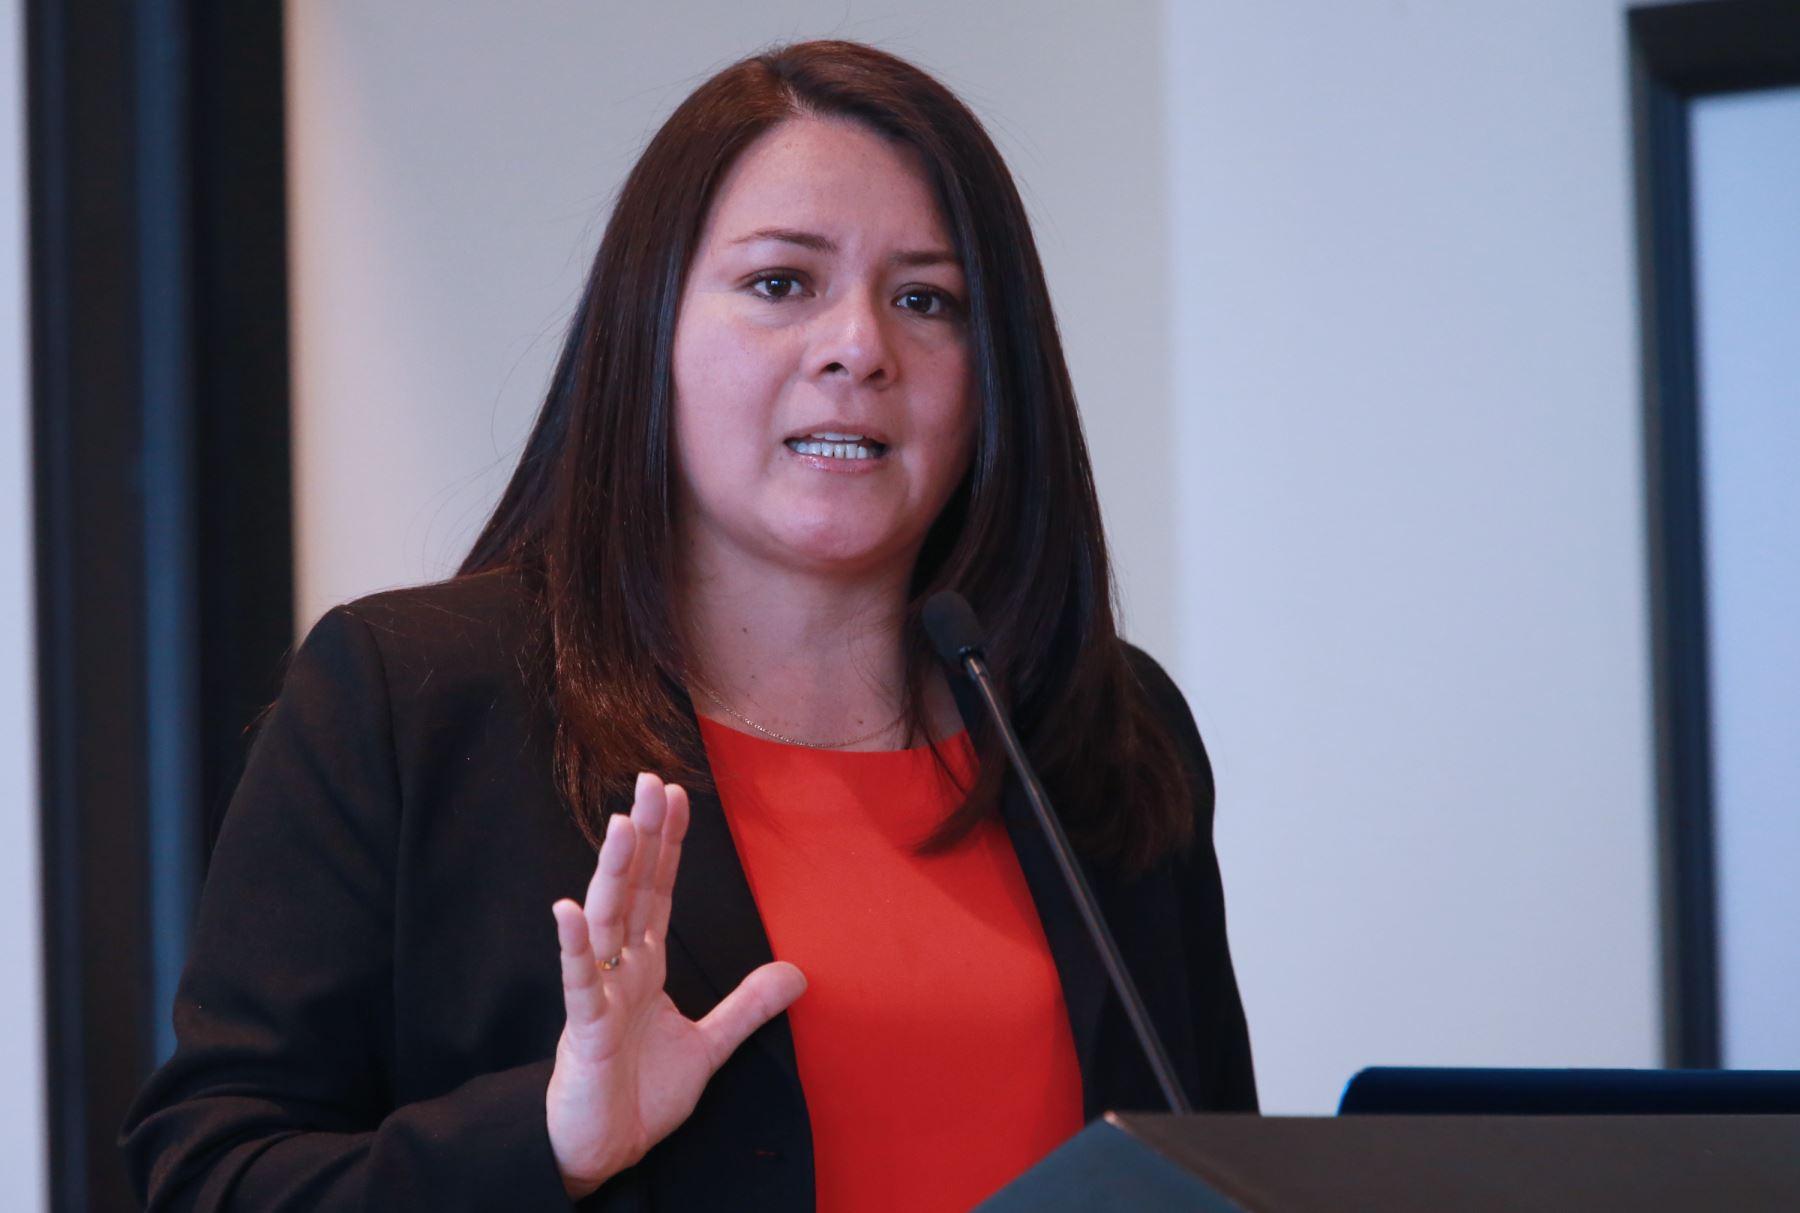 Marushka Chocobar, Secretaria de Gobierno Digital de la PCM. Foto: ANDINA/Norman Córdova